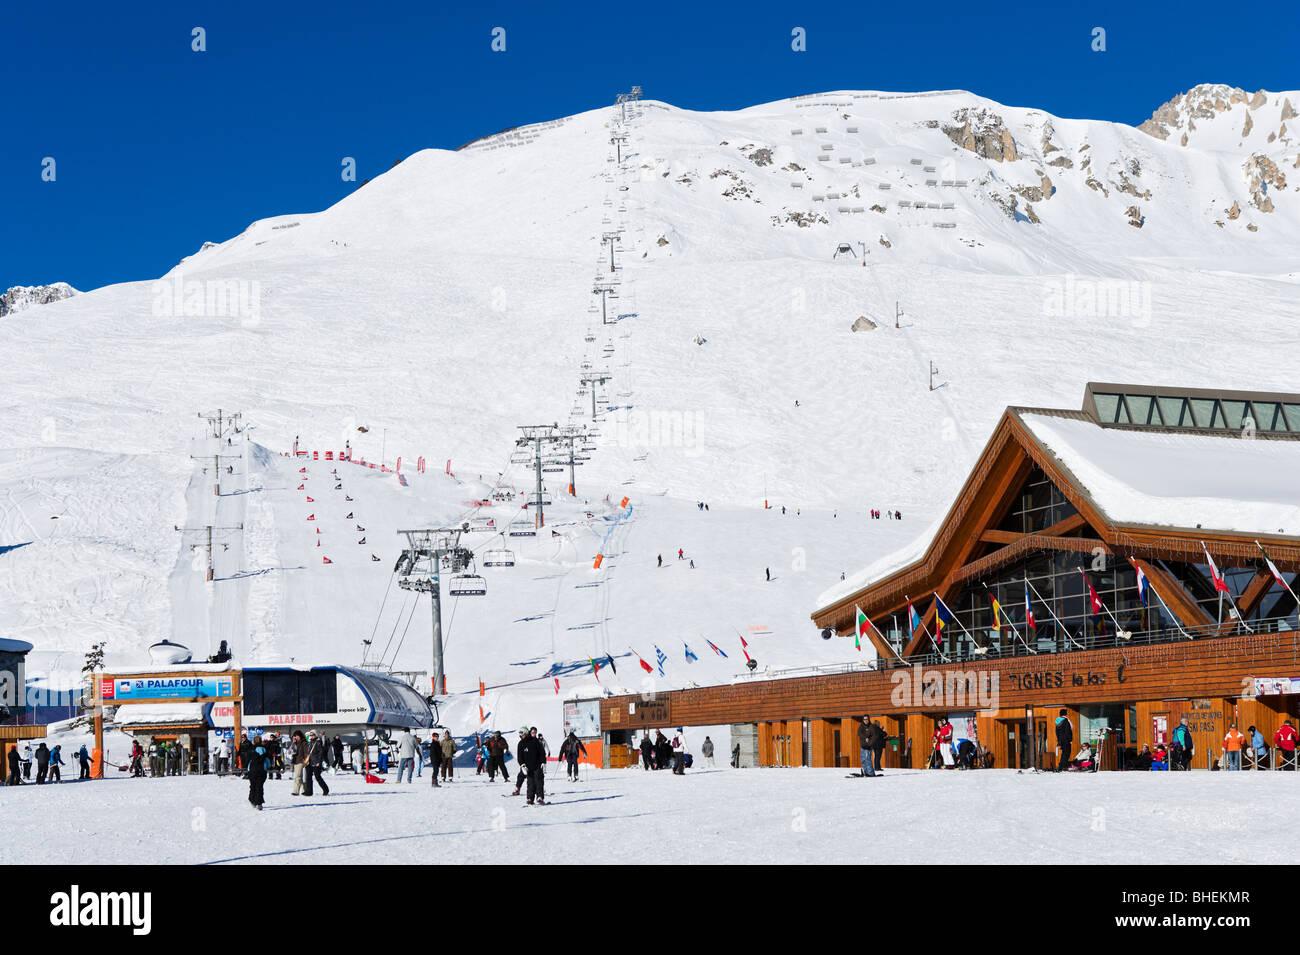 Lifts in the centre of Tignes Le Lac, Tignes, Espace Killy, Tarentaise, Savoie, France Stock Photo